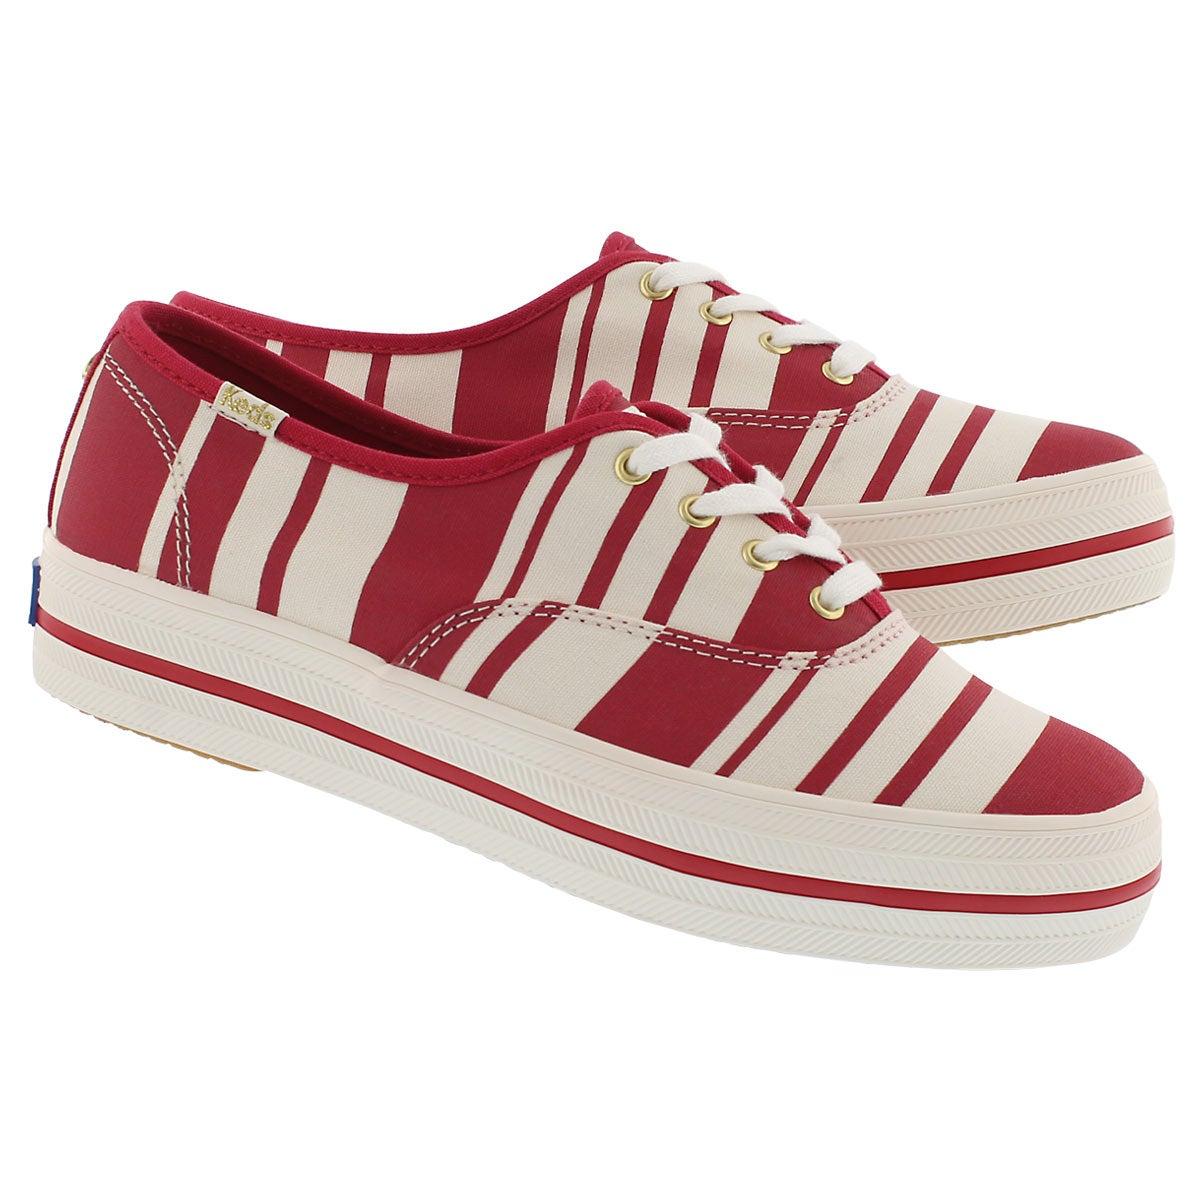 Lds Kate Spade Triple Stripe red snkr